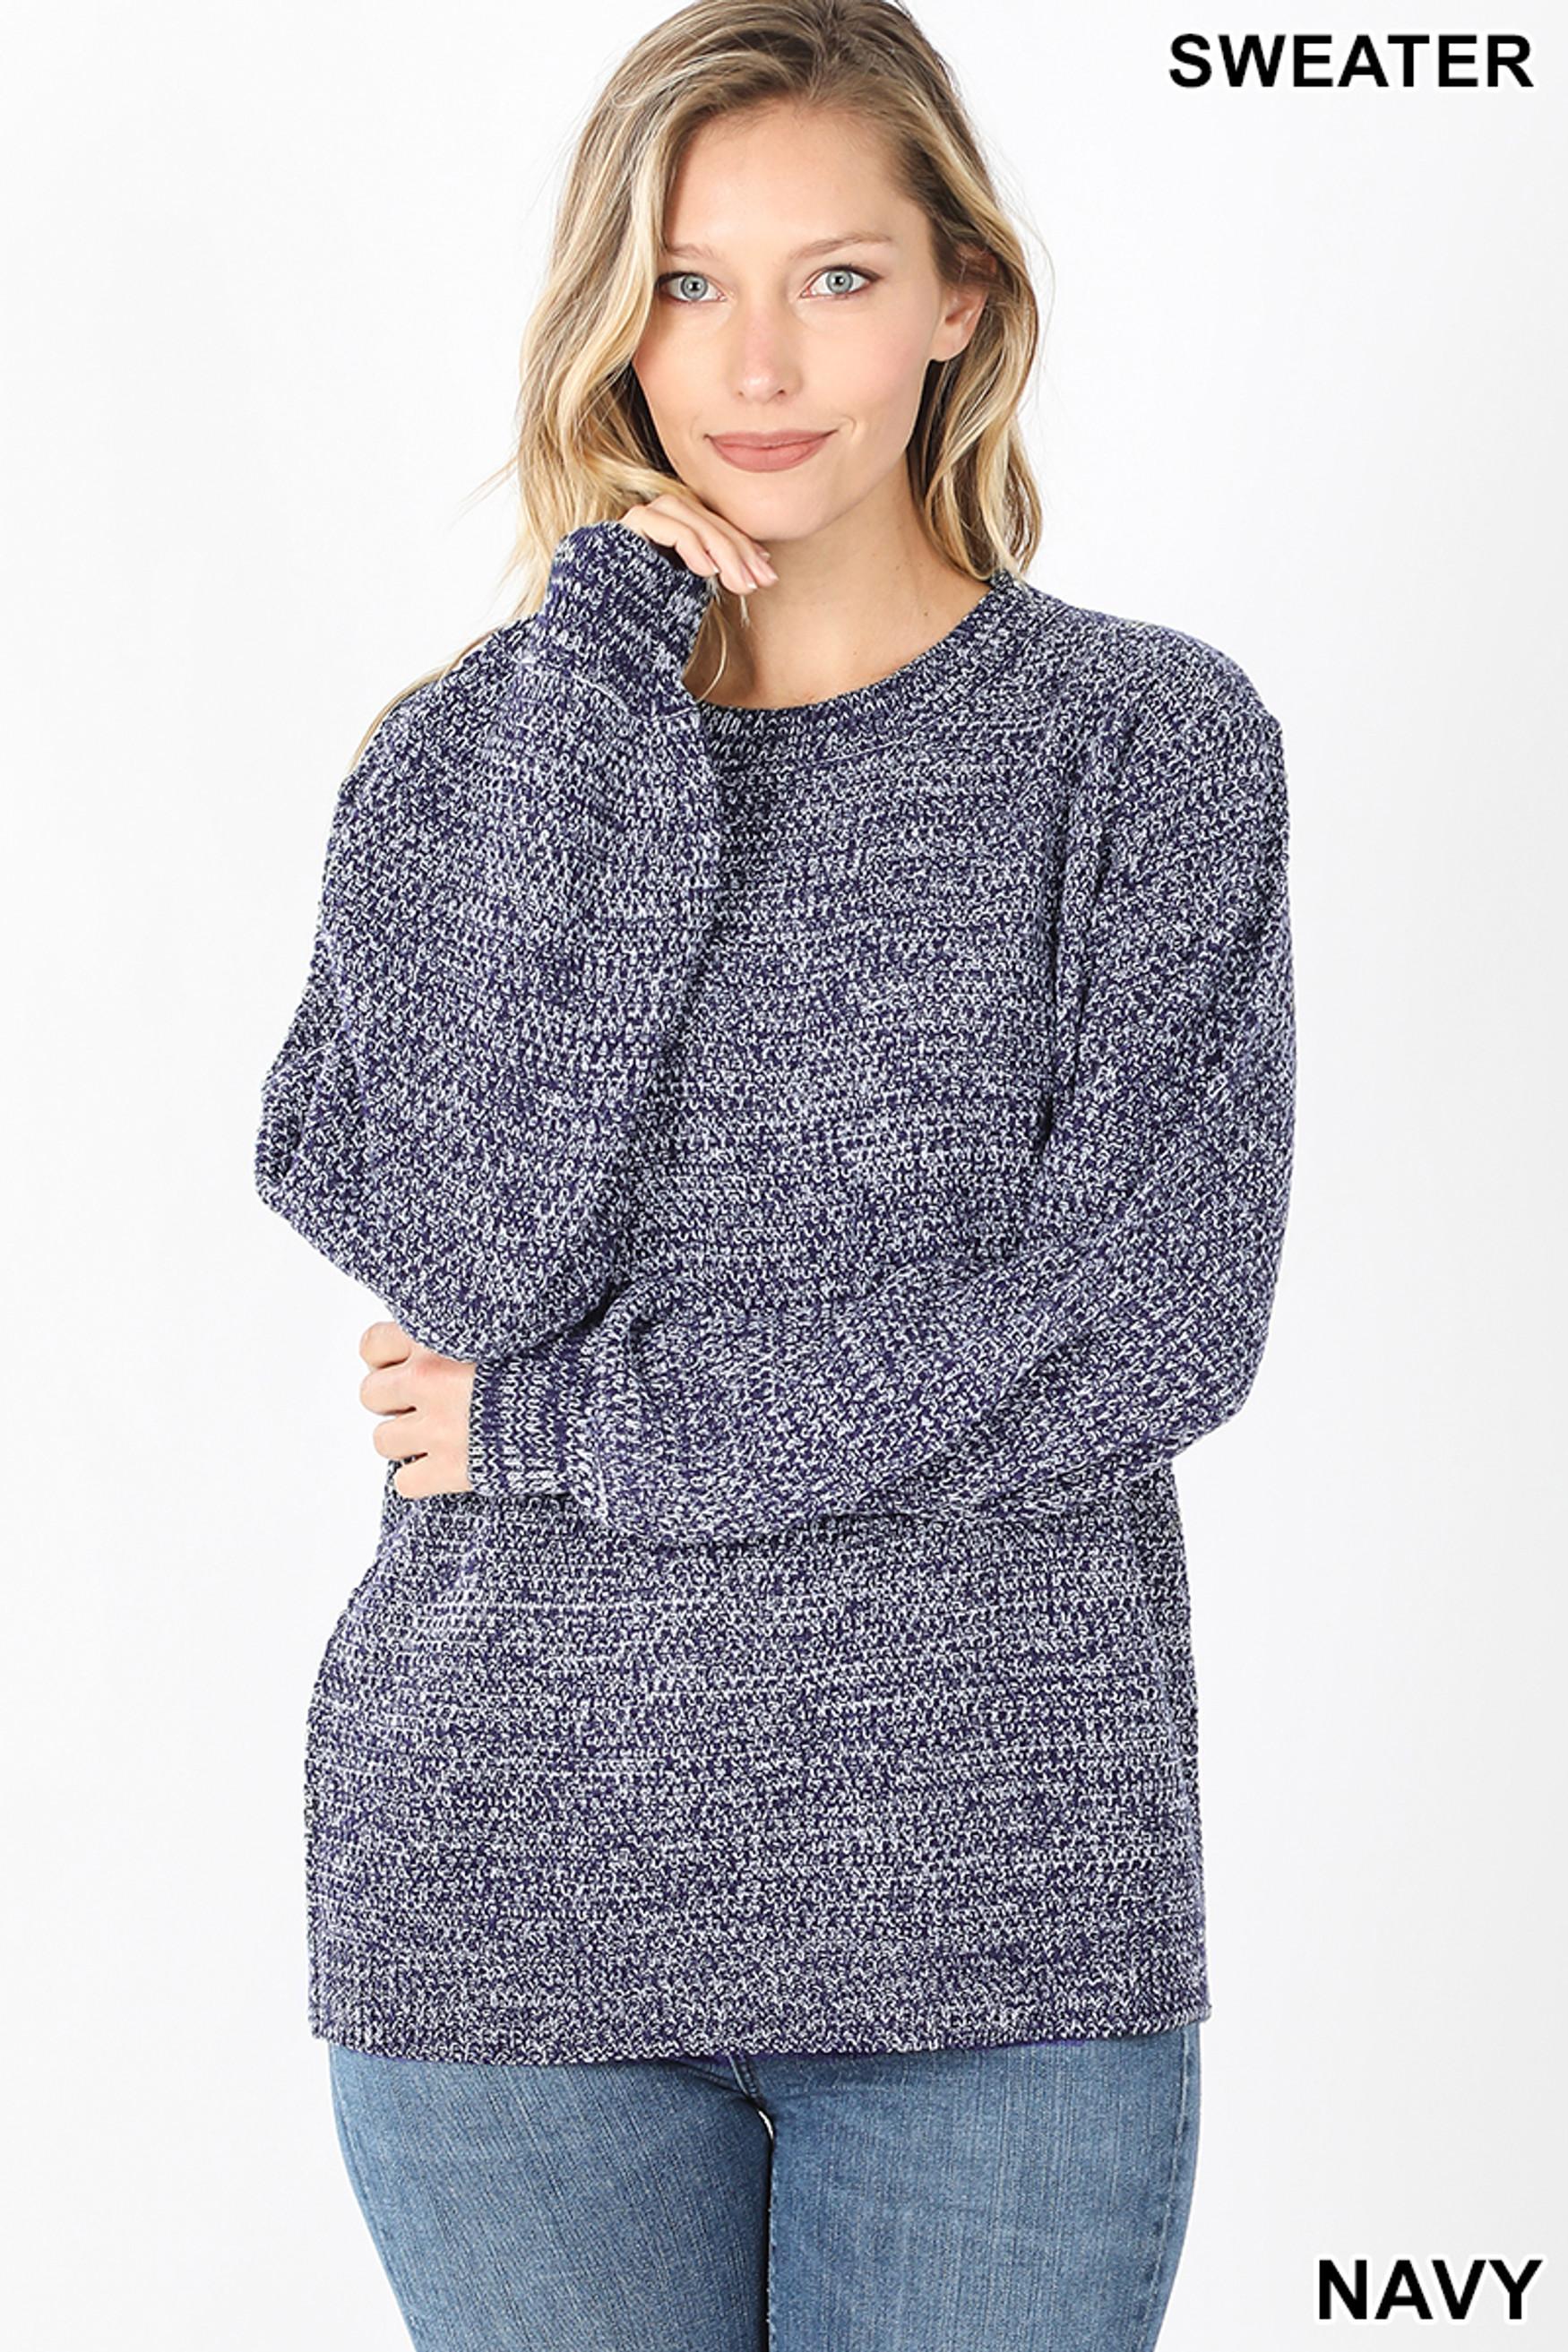 Front image of Navy Balloon Sleeve Melange Sweater